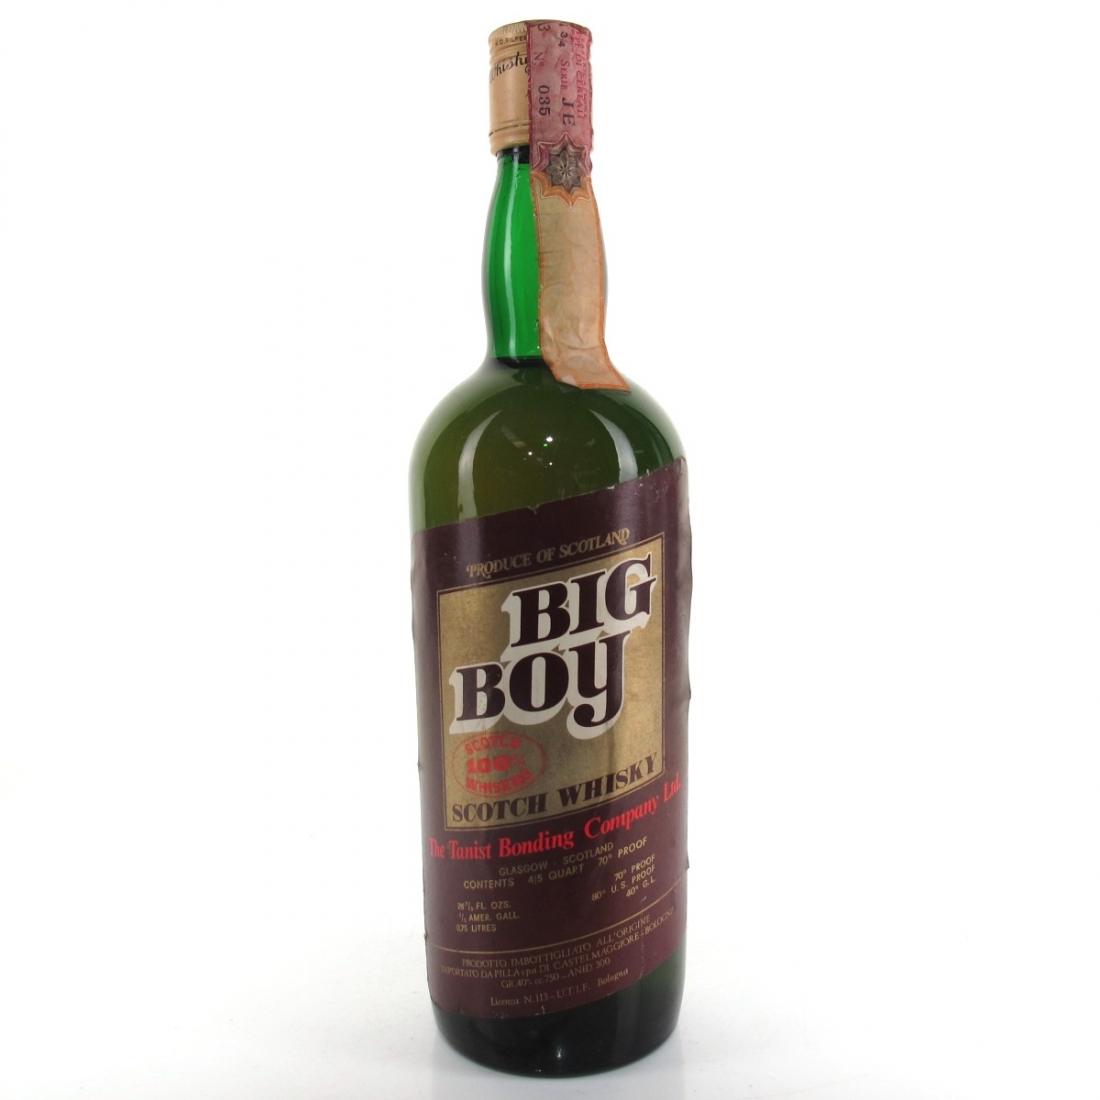 Big Boy Scotch Whisky 1970s